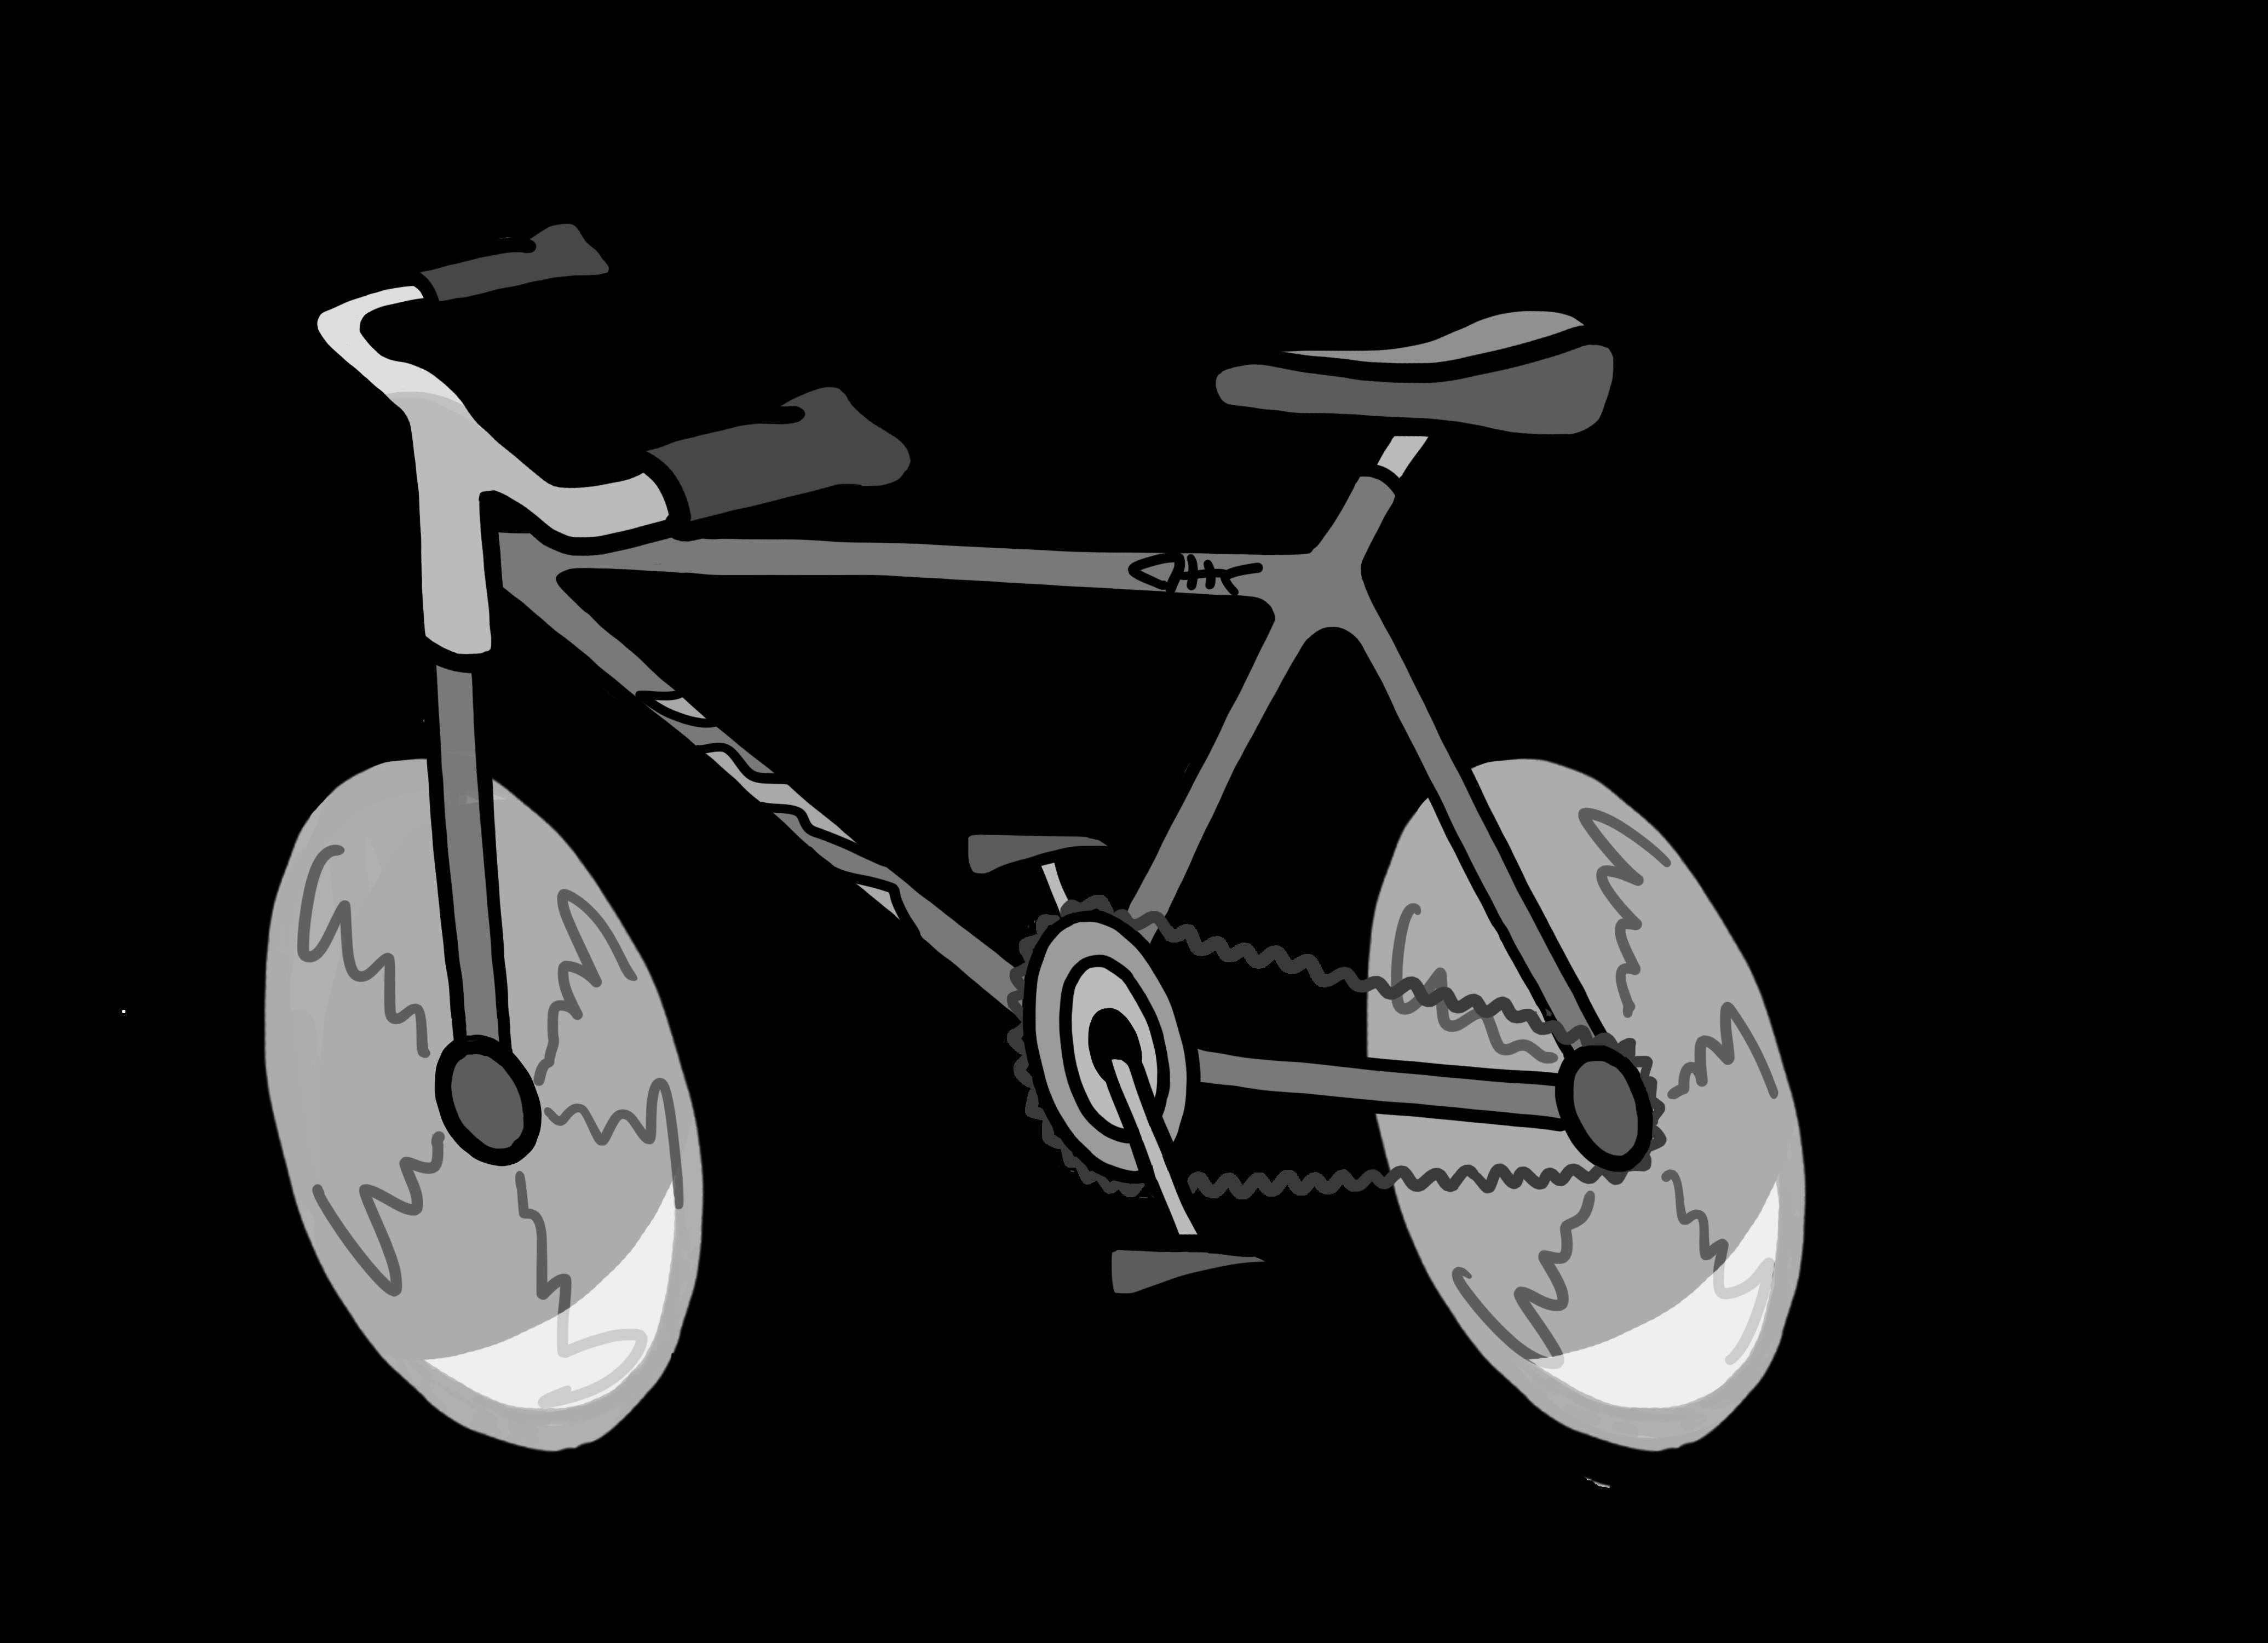 Clipart bicycle transportation. Clipartblack com free black